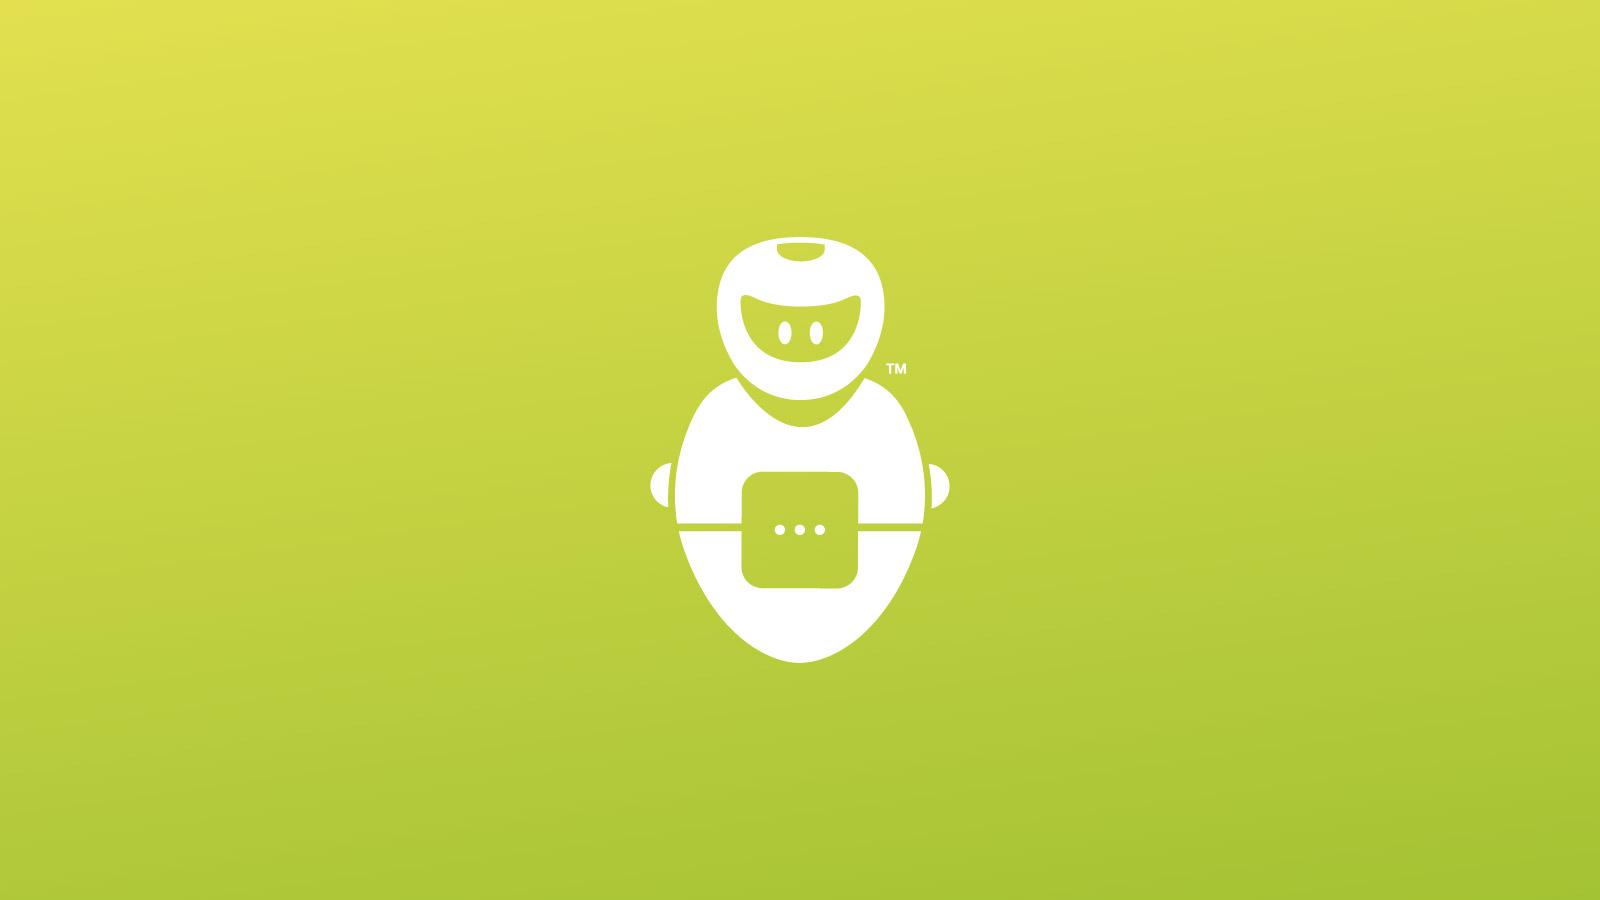 GblobalBot branding and logo design on green colour background.